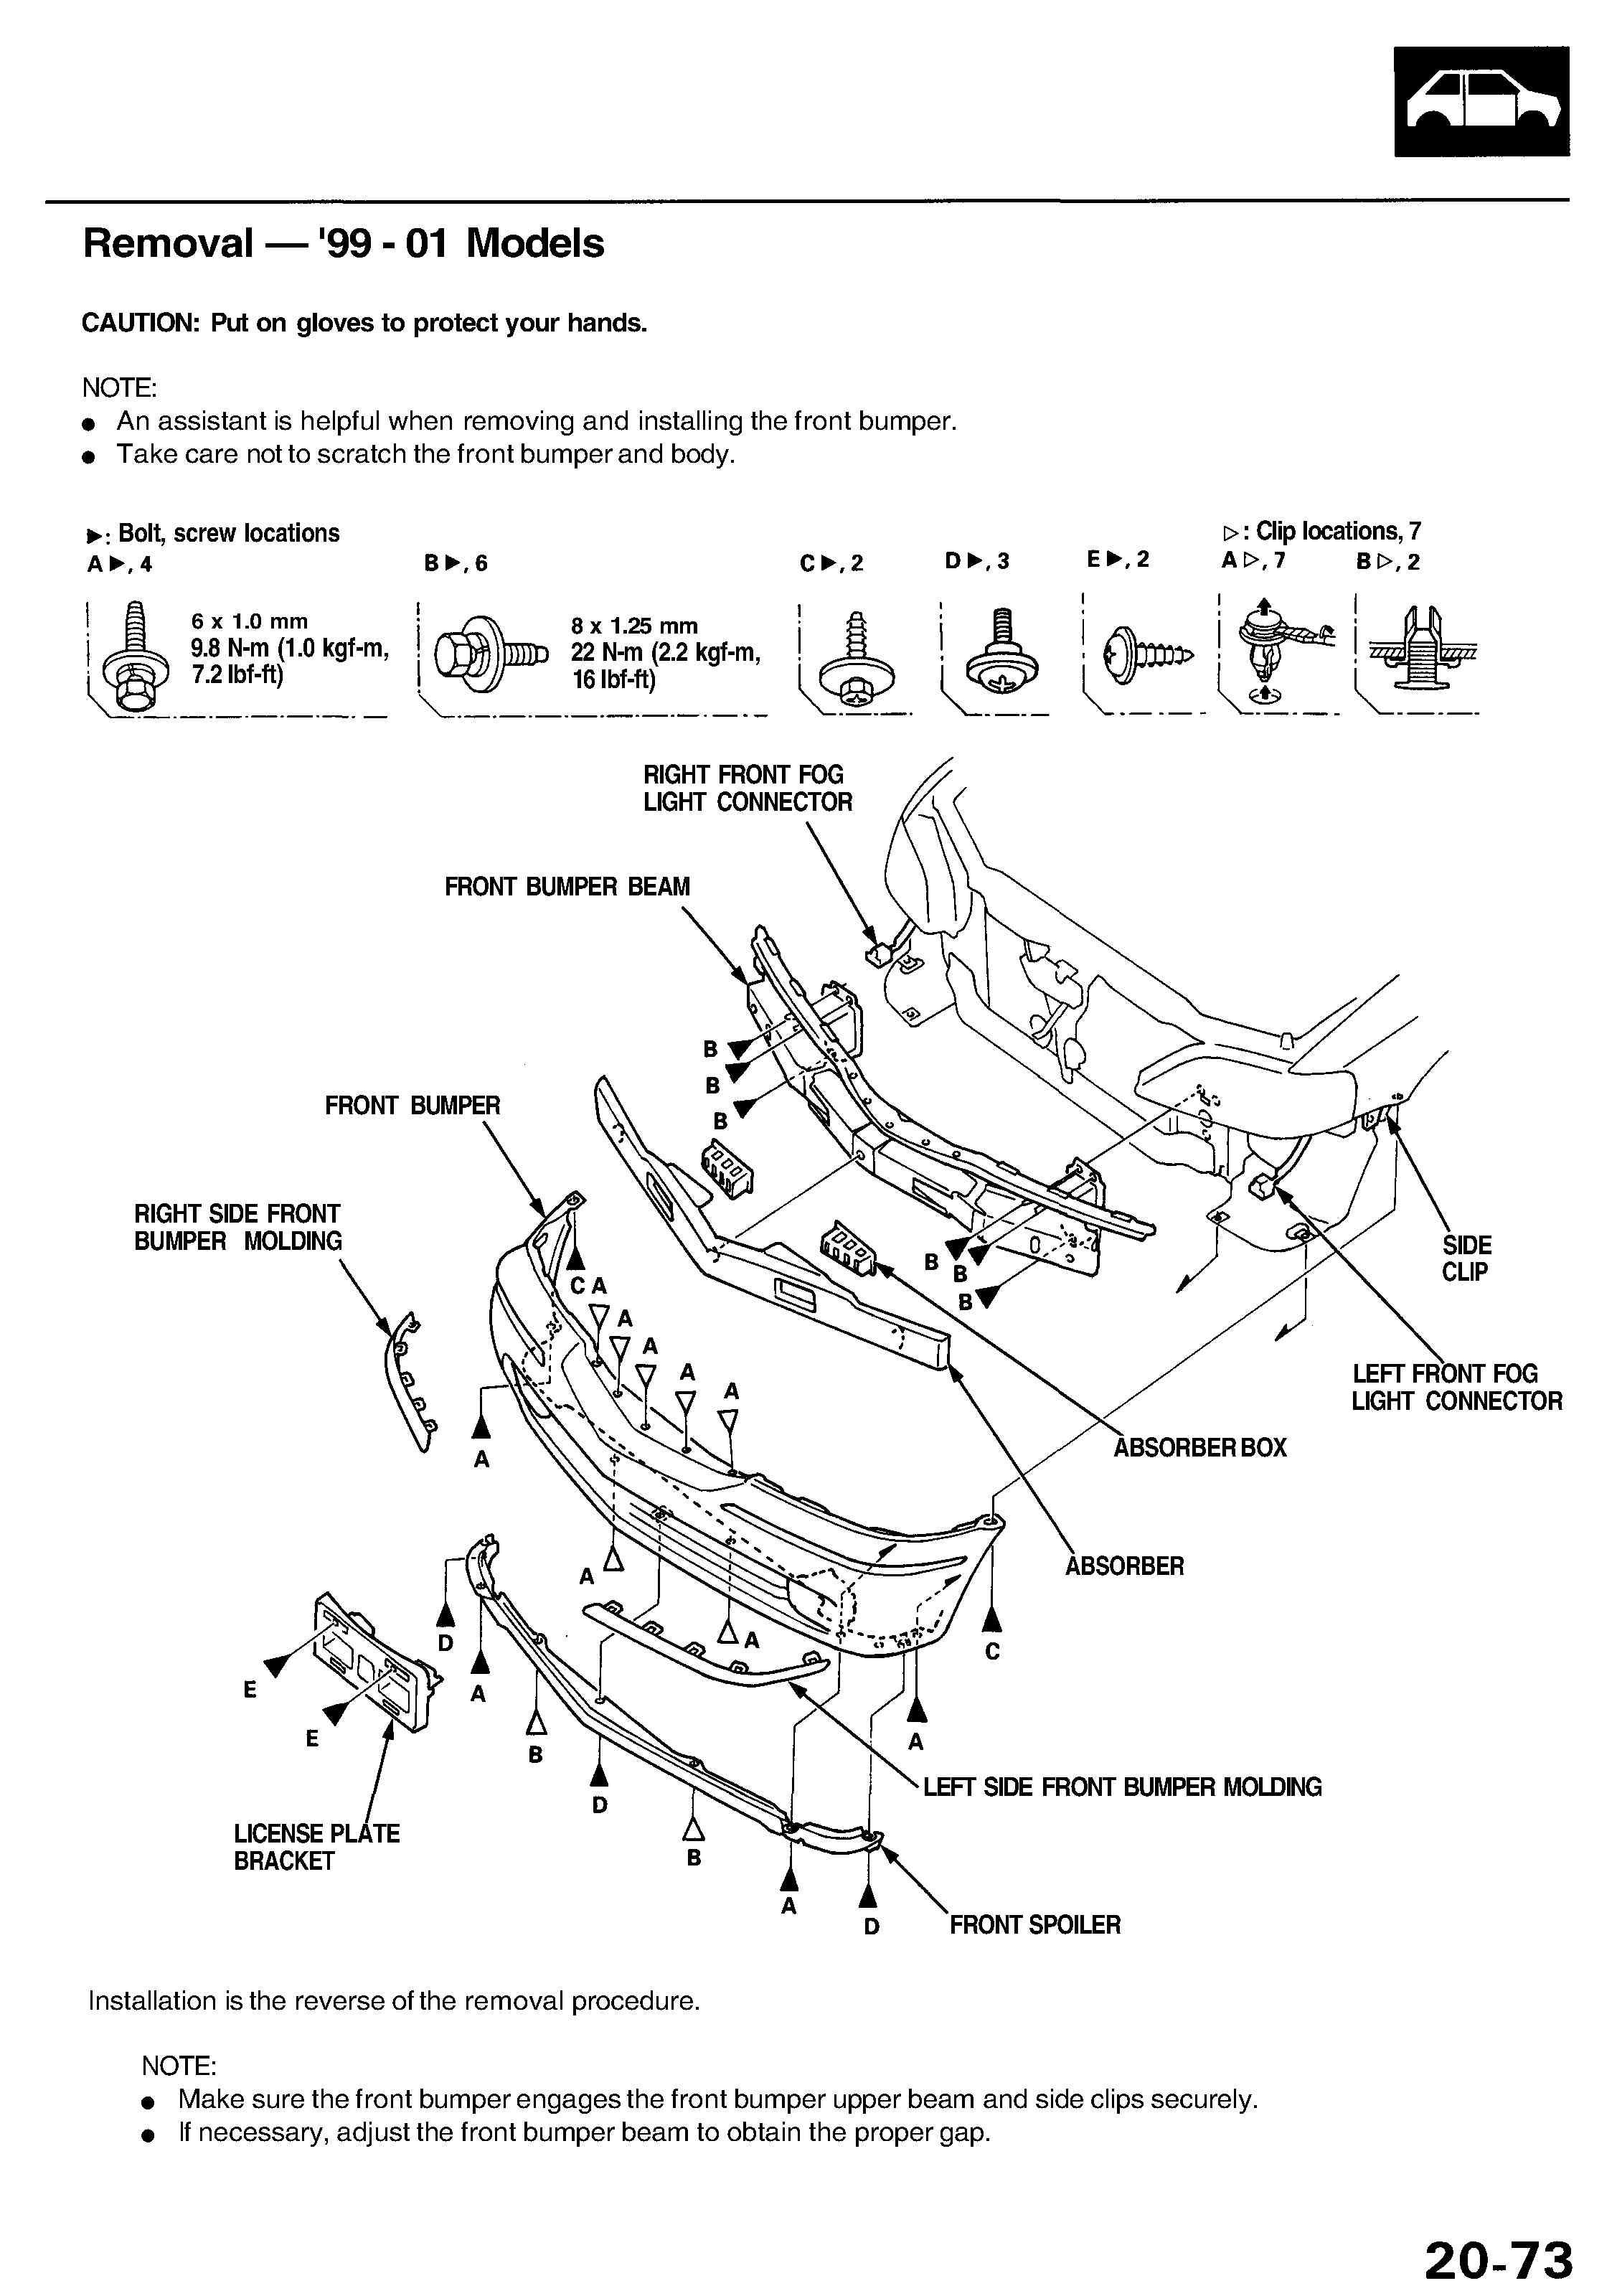 acura integra bumper parts diagram  acura  auto wiring diagram